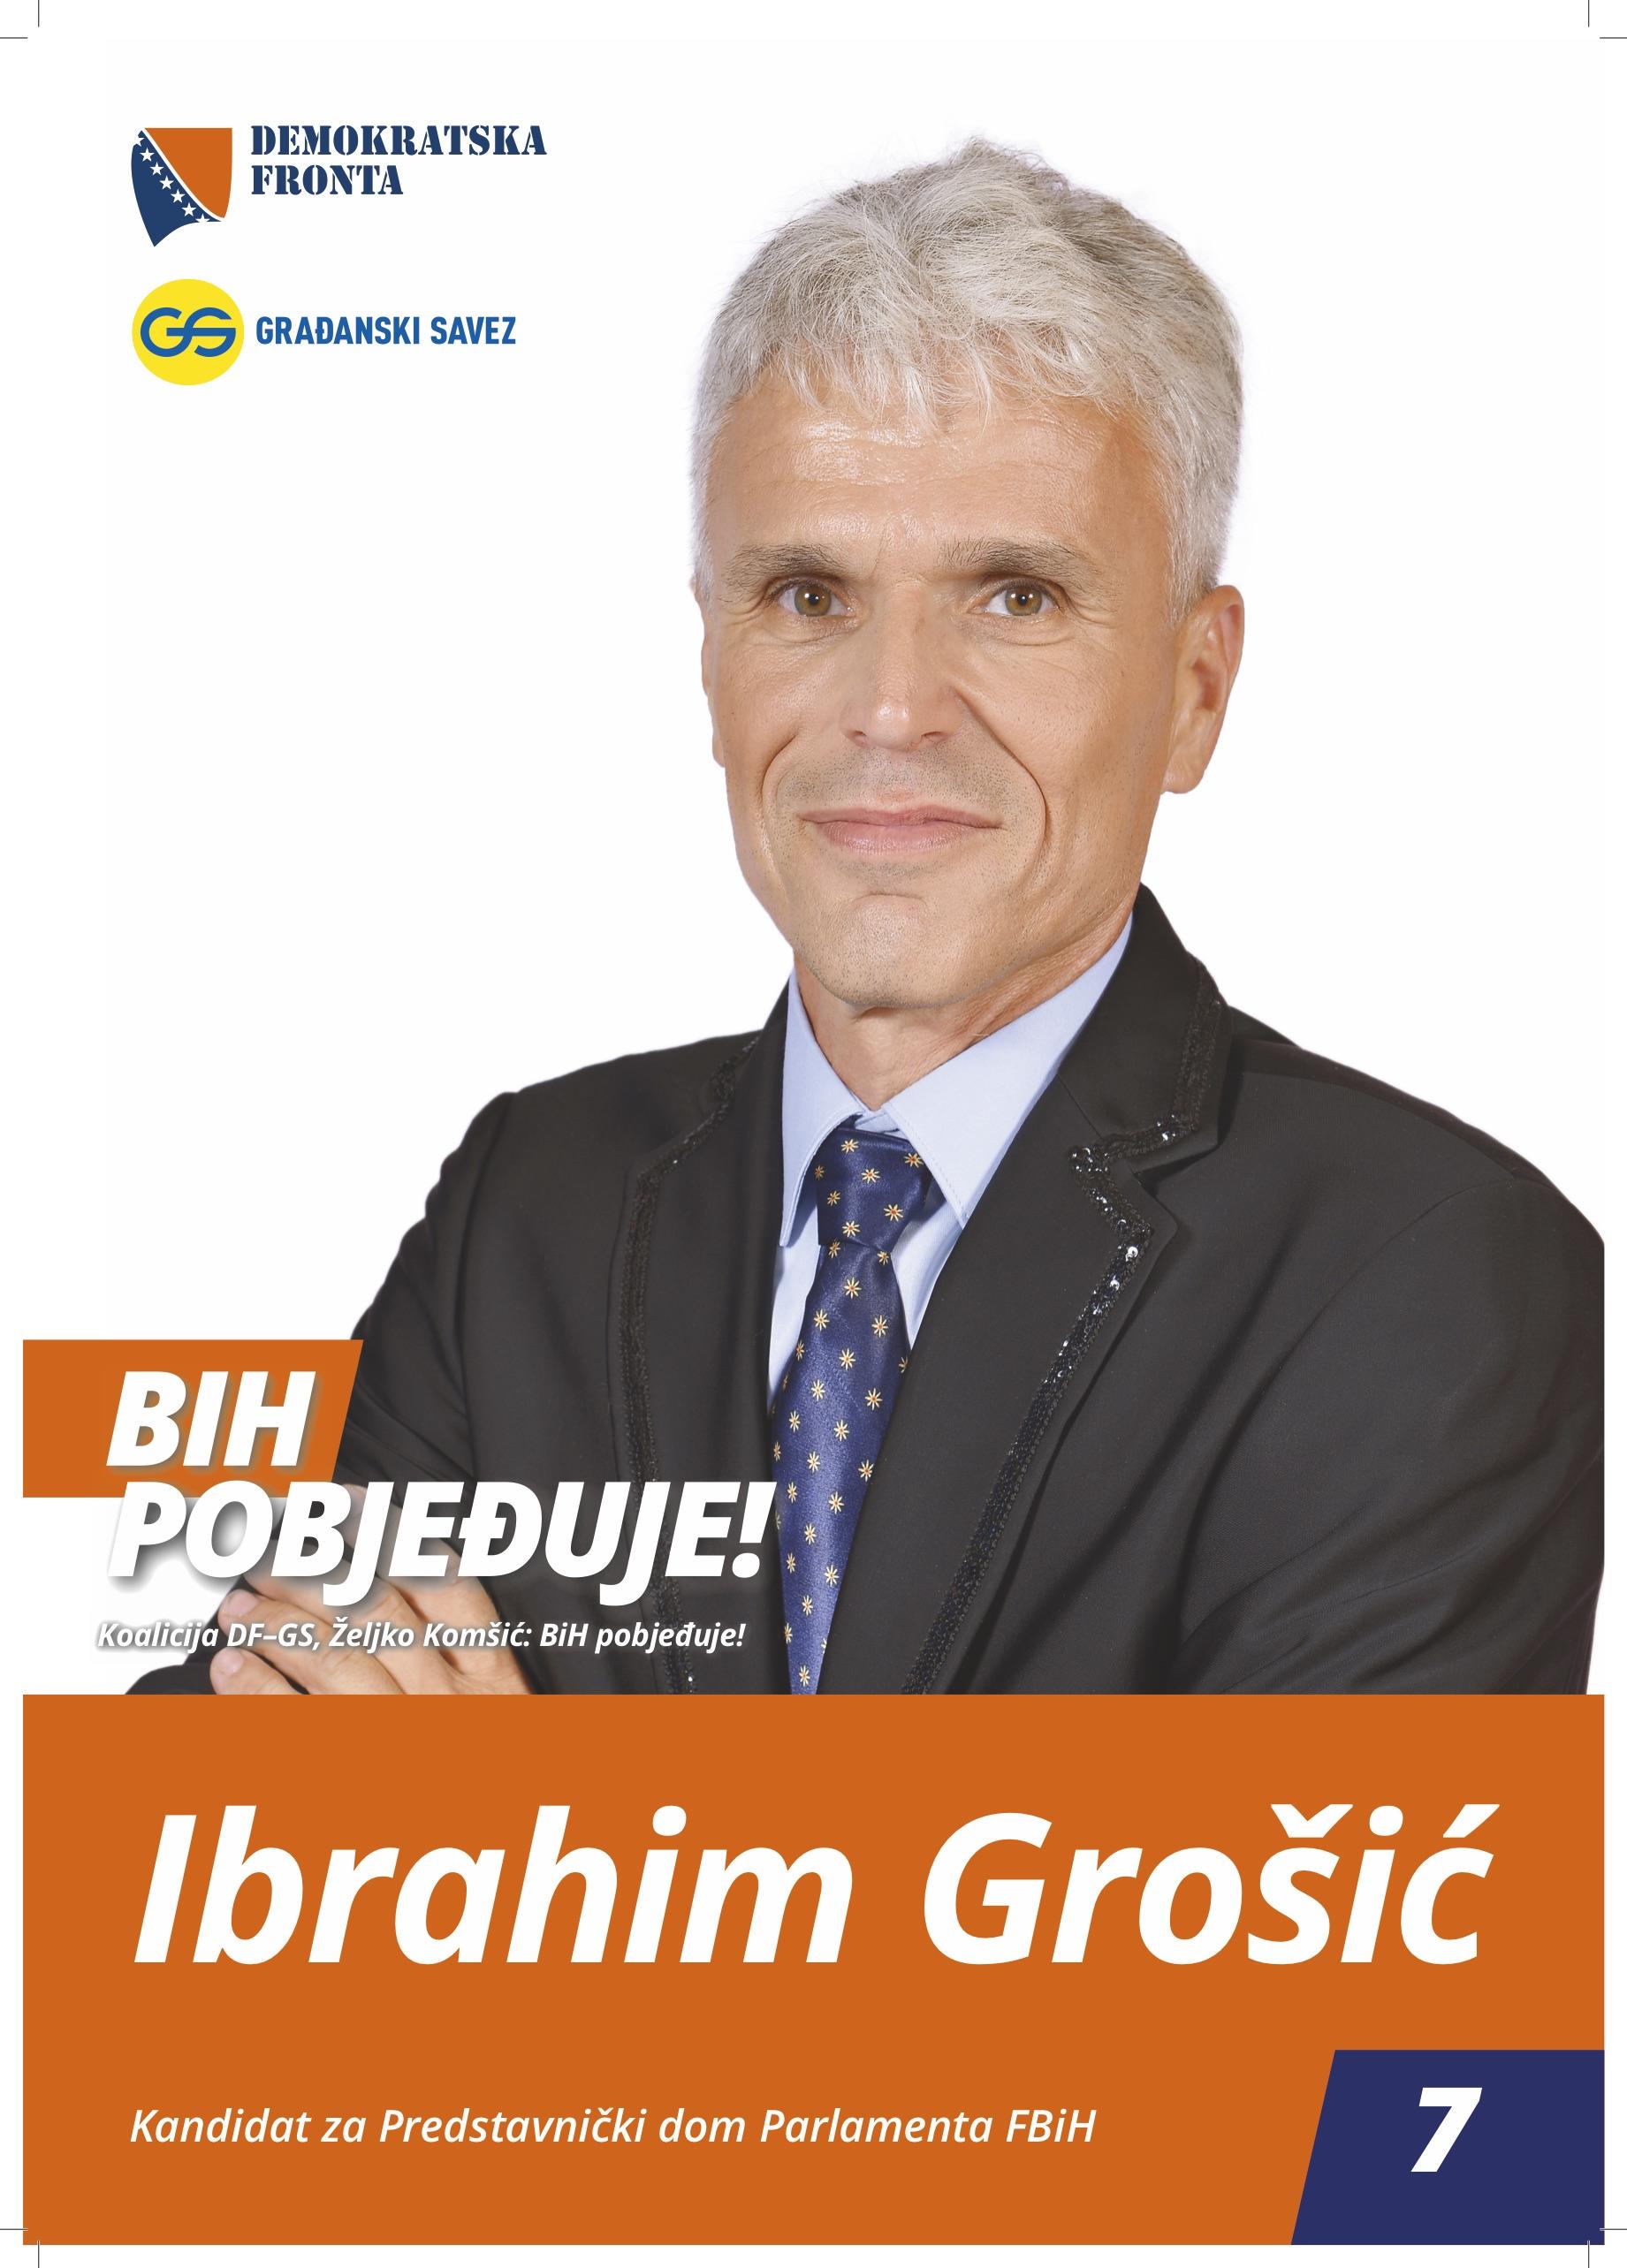 Ibrahim Grošić, diplomirani inžinjer poljoprivrede